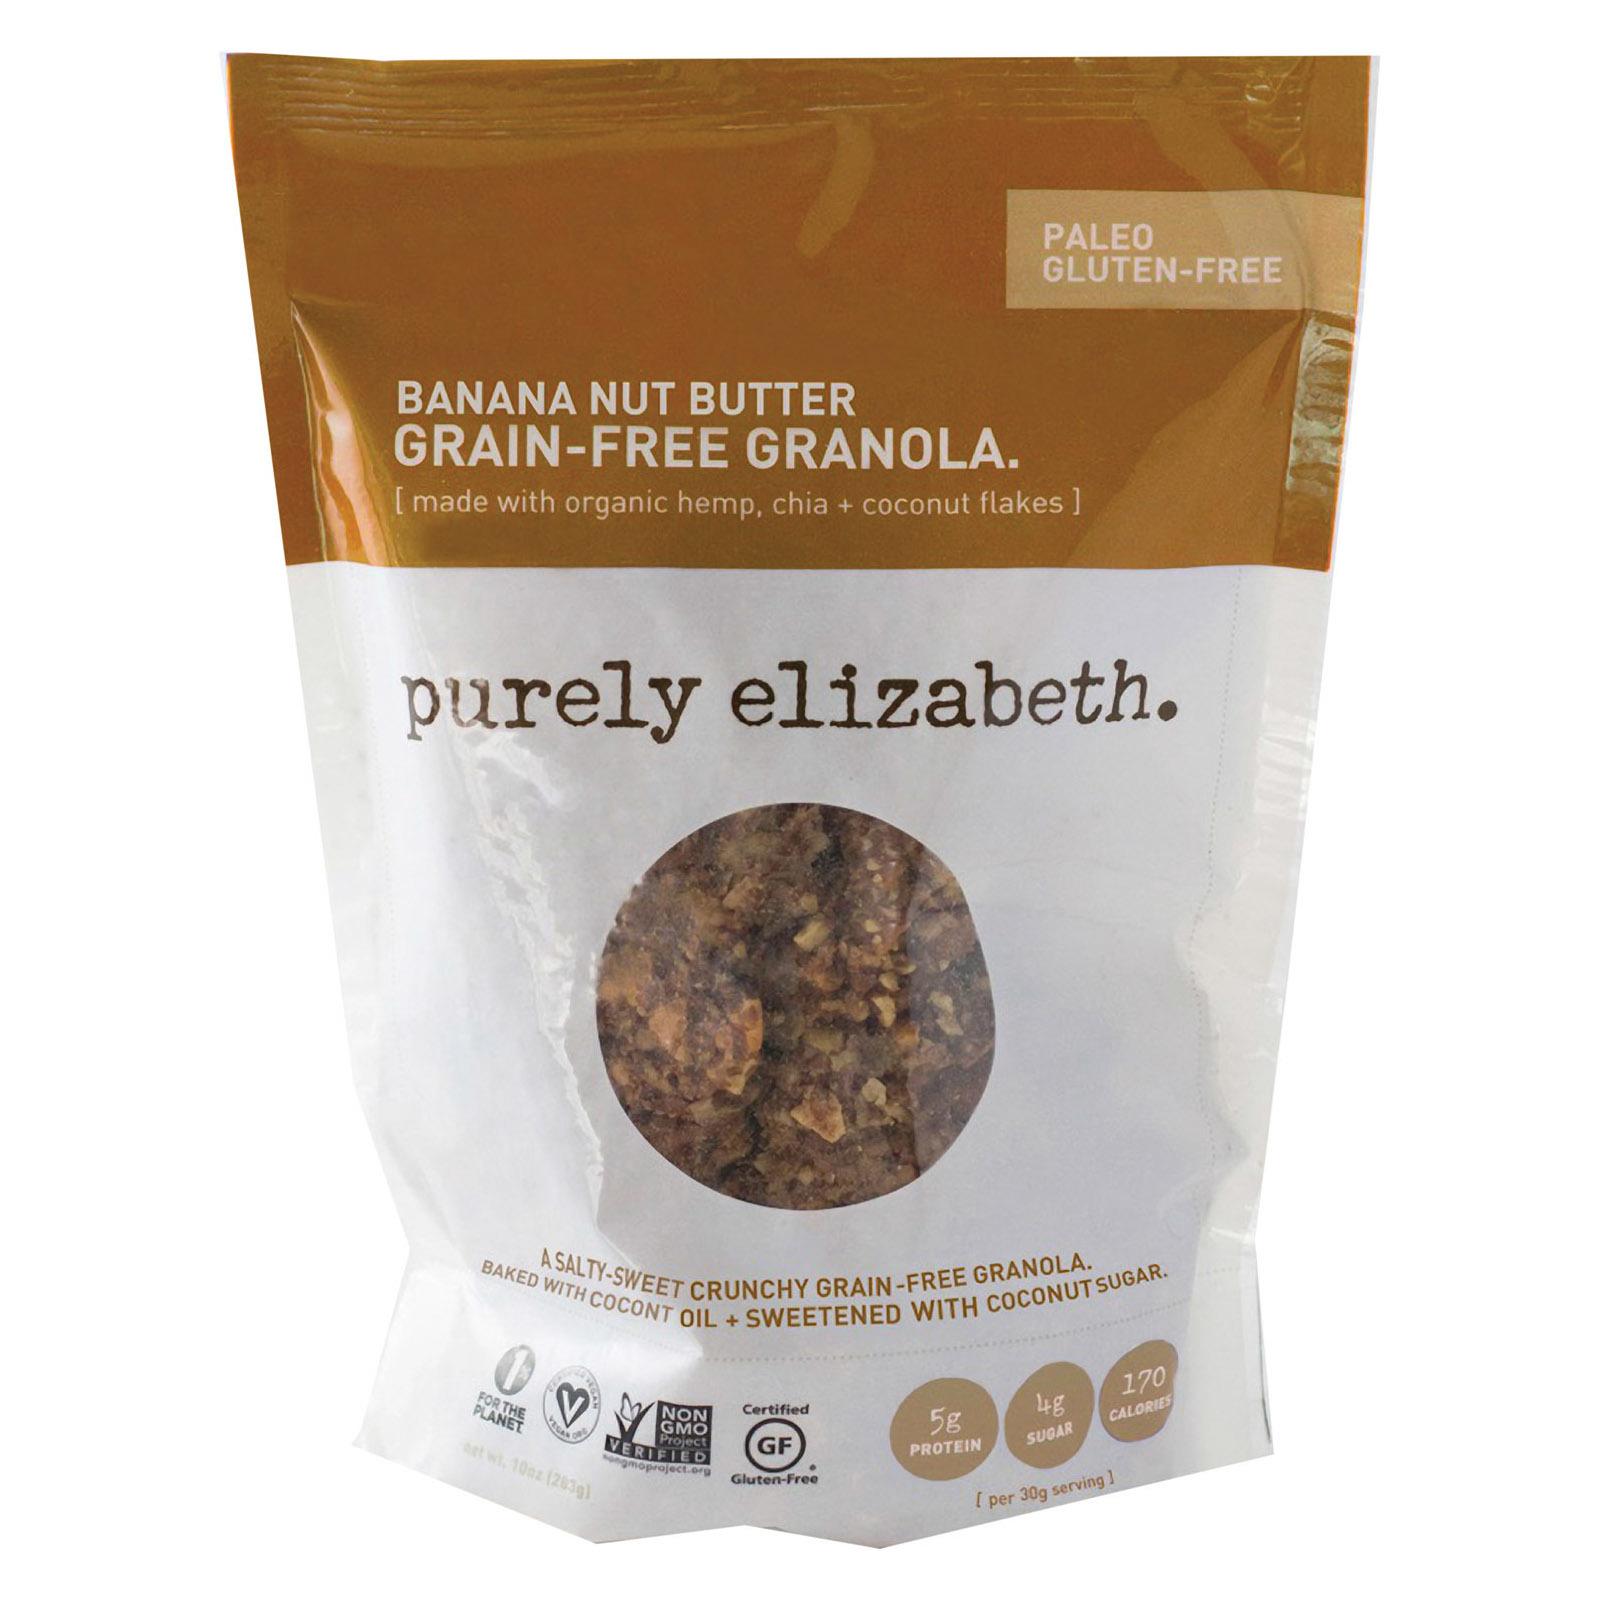 Purely Elizabeth Grain-Free Granola - Banana Nut Butter - Case of 6 - 8 oz.